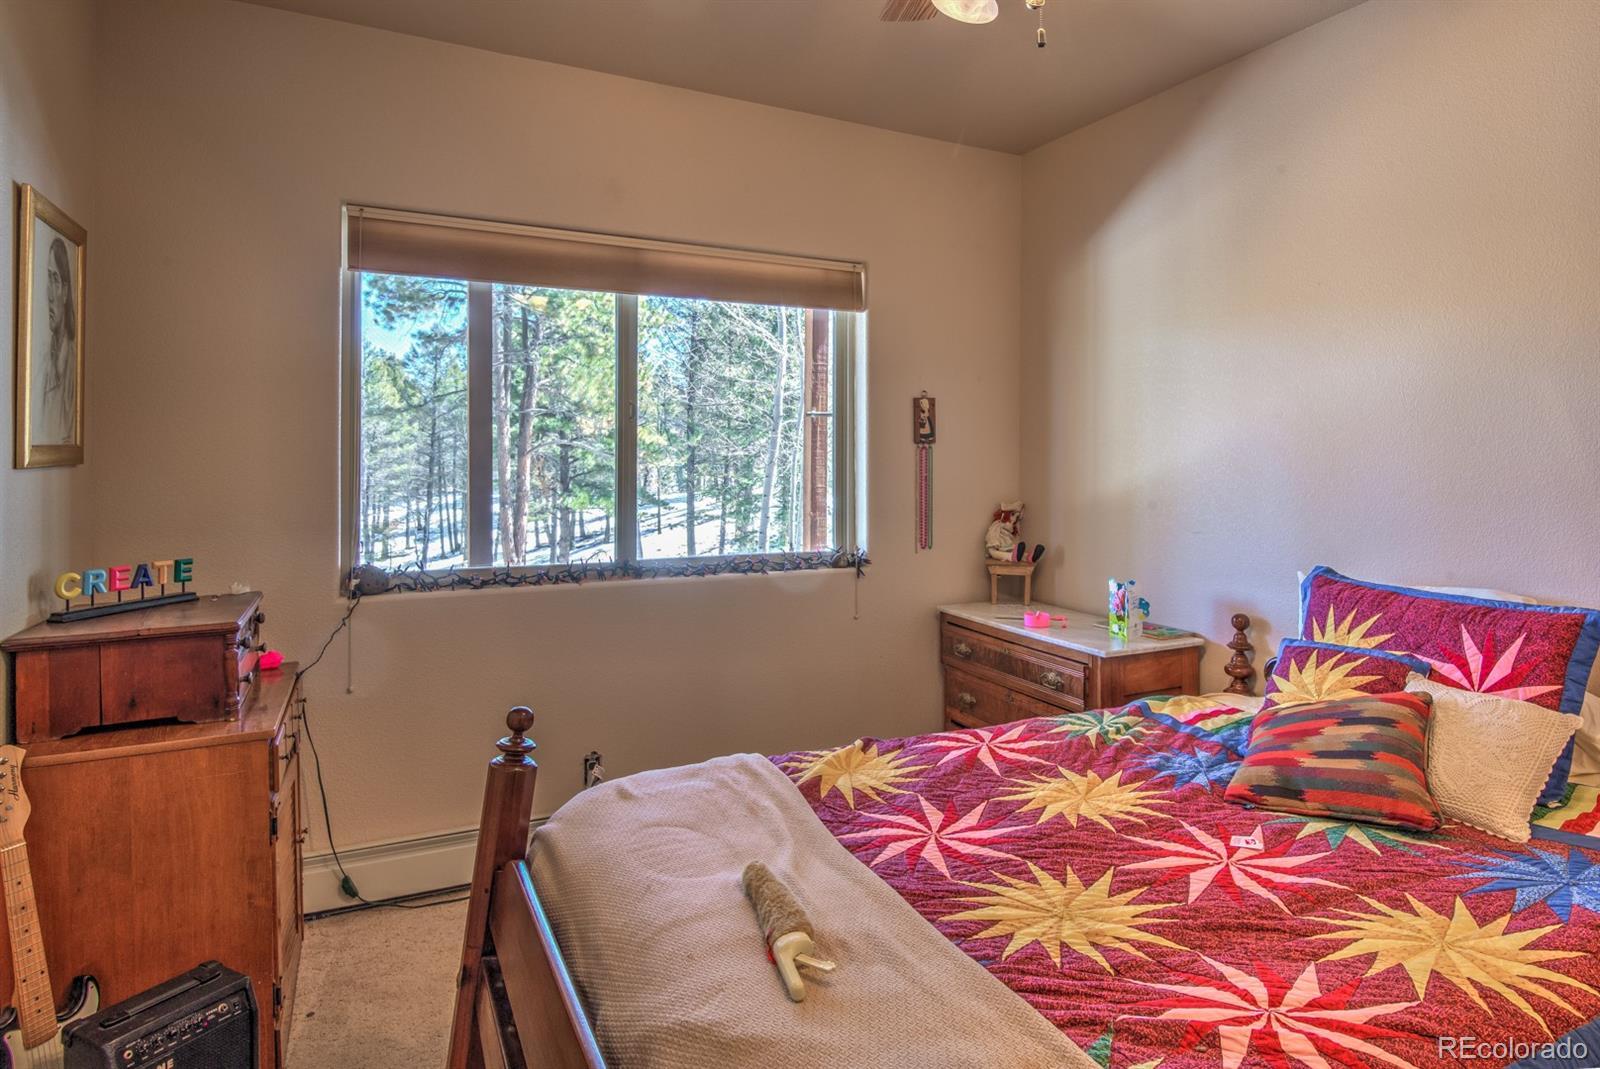 MLS# 6725557 - 24 - 126 Druid Trail, Florissant, CO 80816